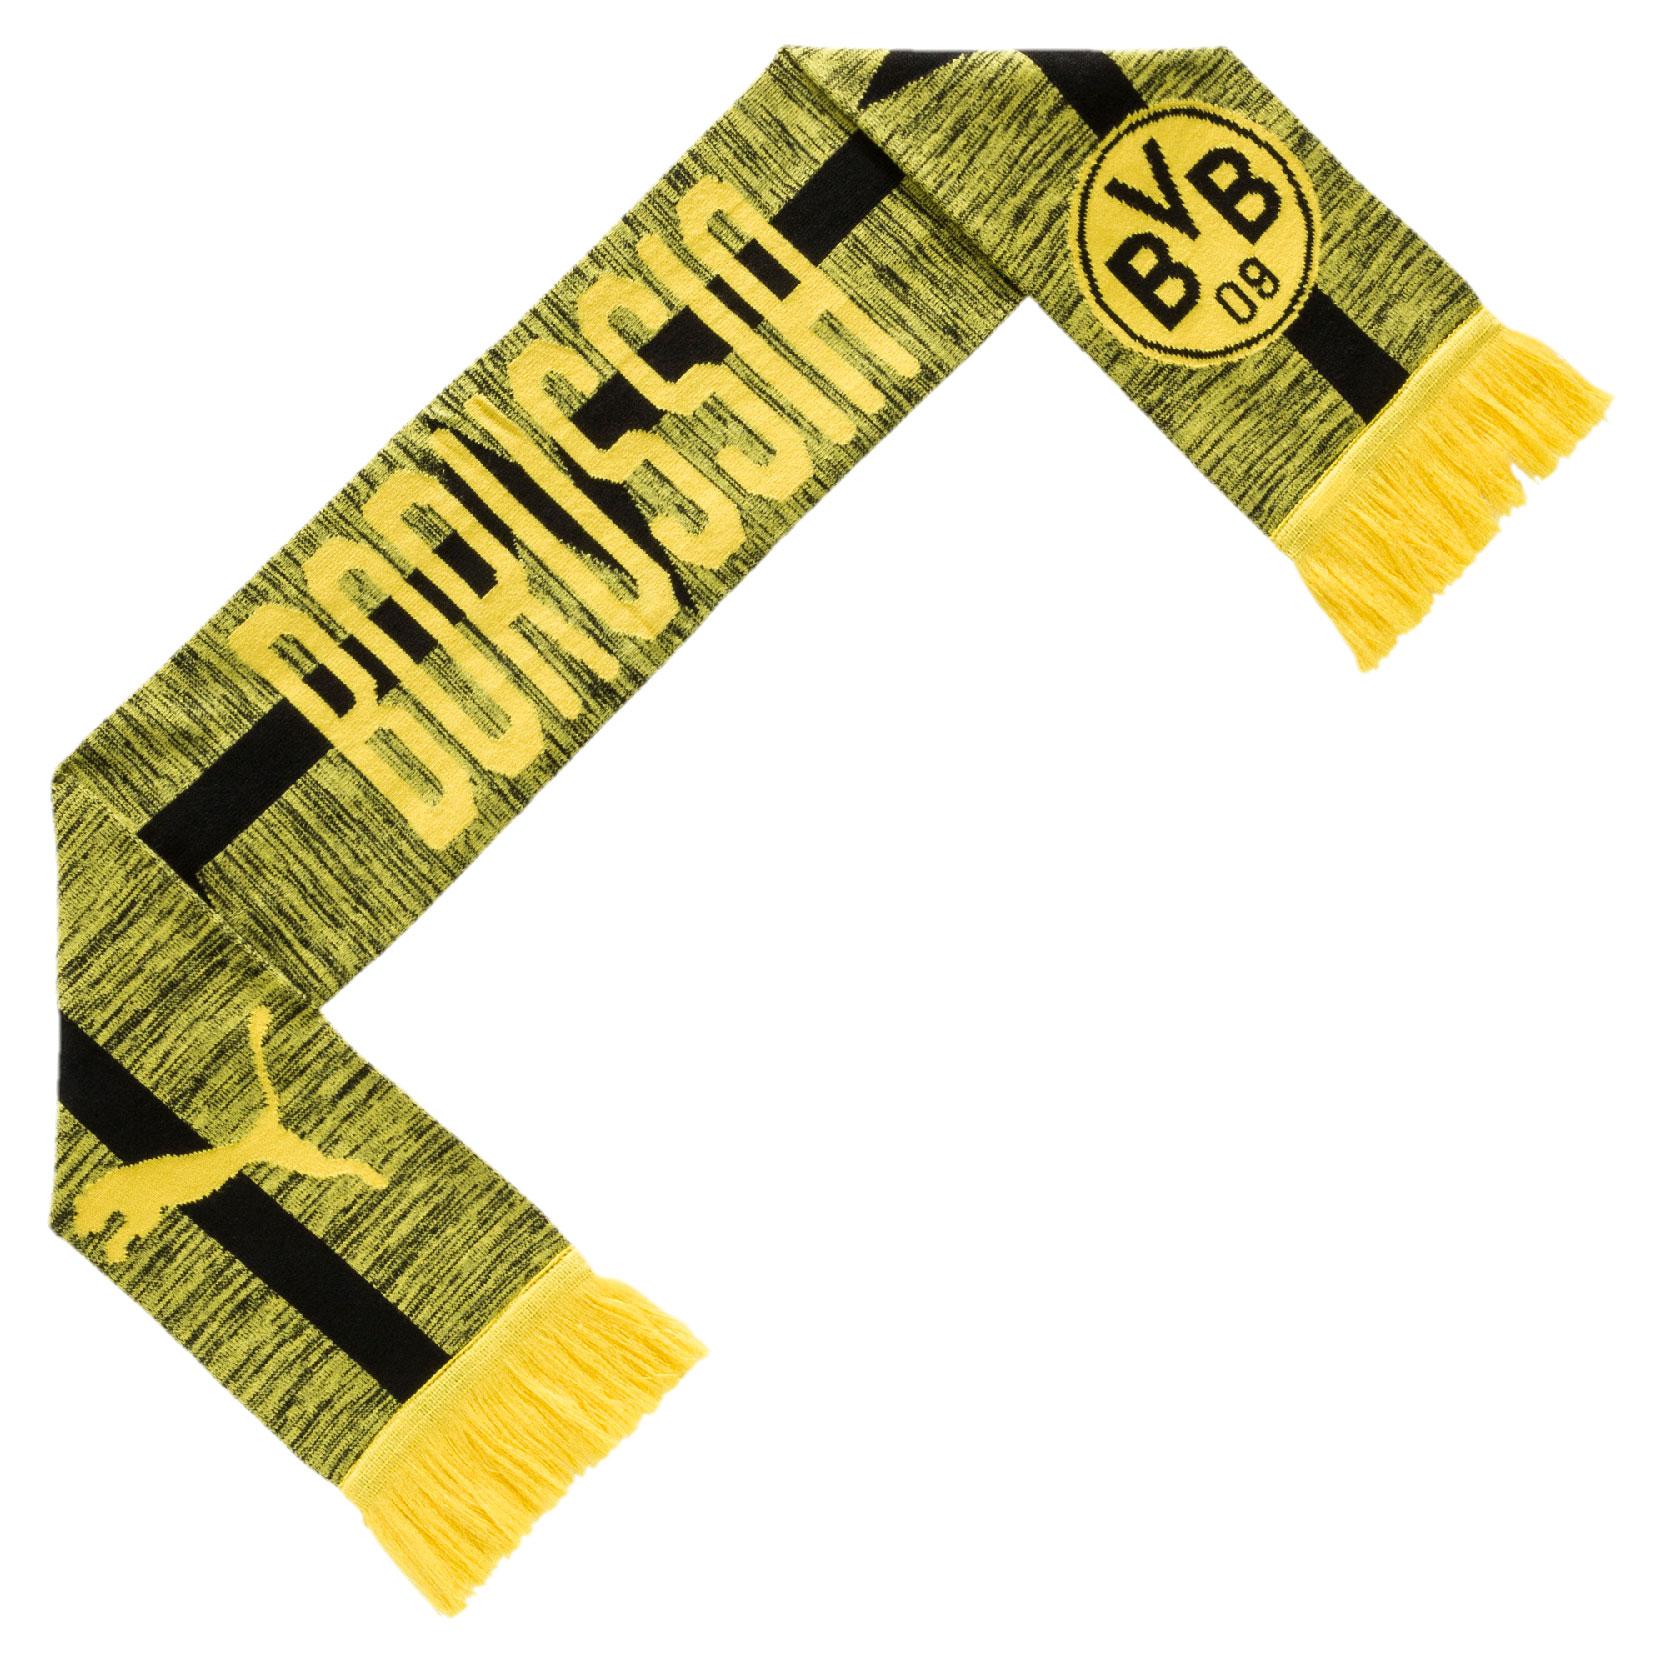 Puma BVB Borussia Dortmund Schal BVB Fan Scarf 053490-01